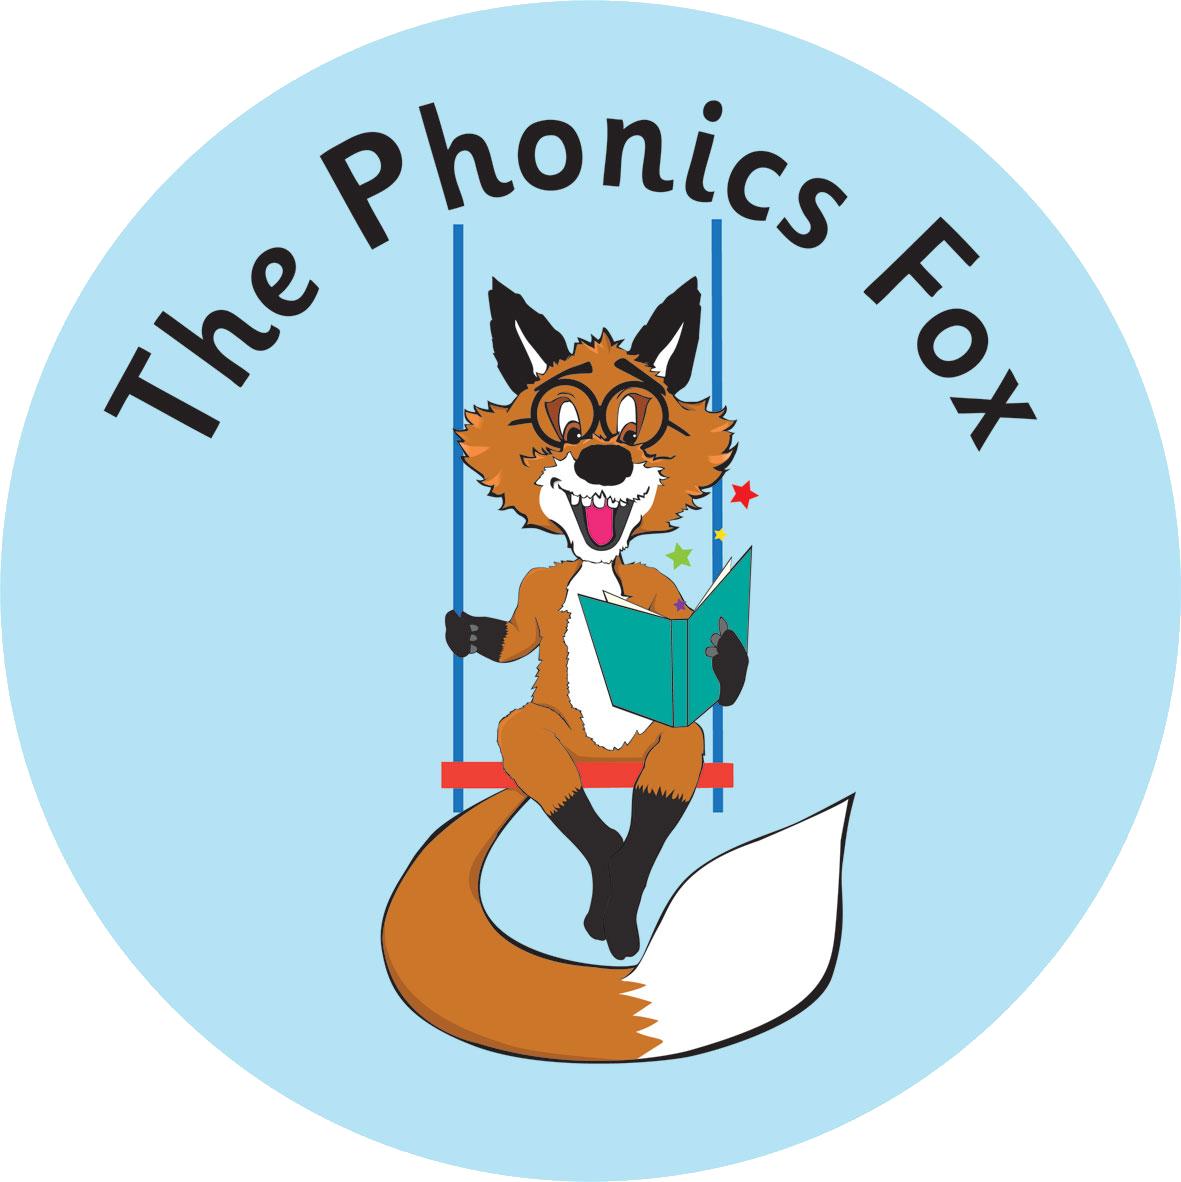 The Phonics Fox- North Bucks, South Northants and North Oxon's logo